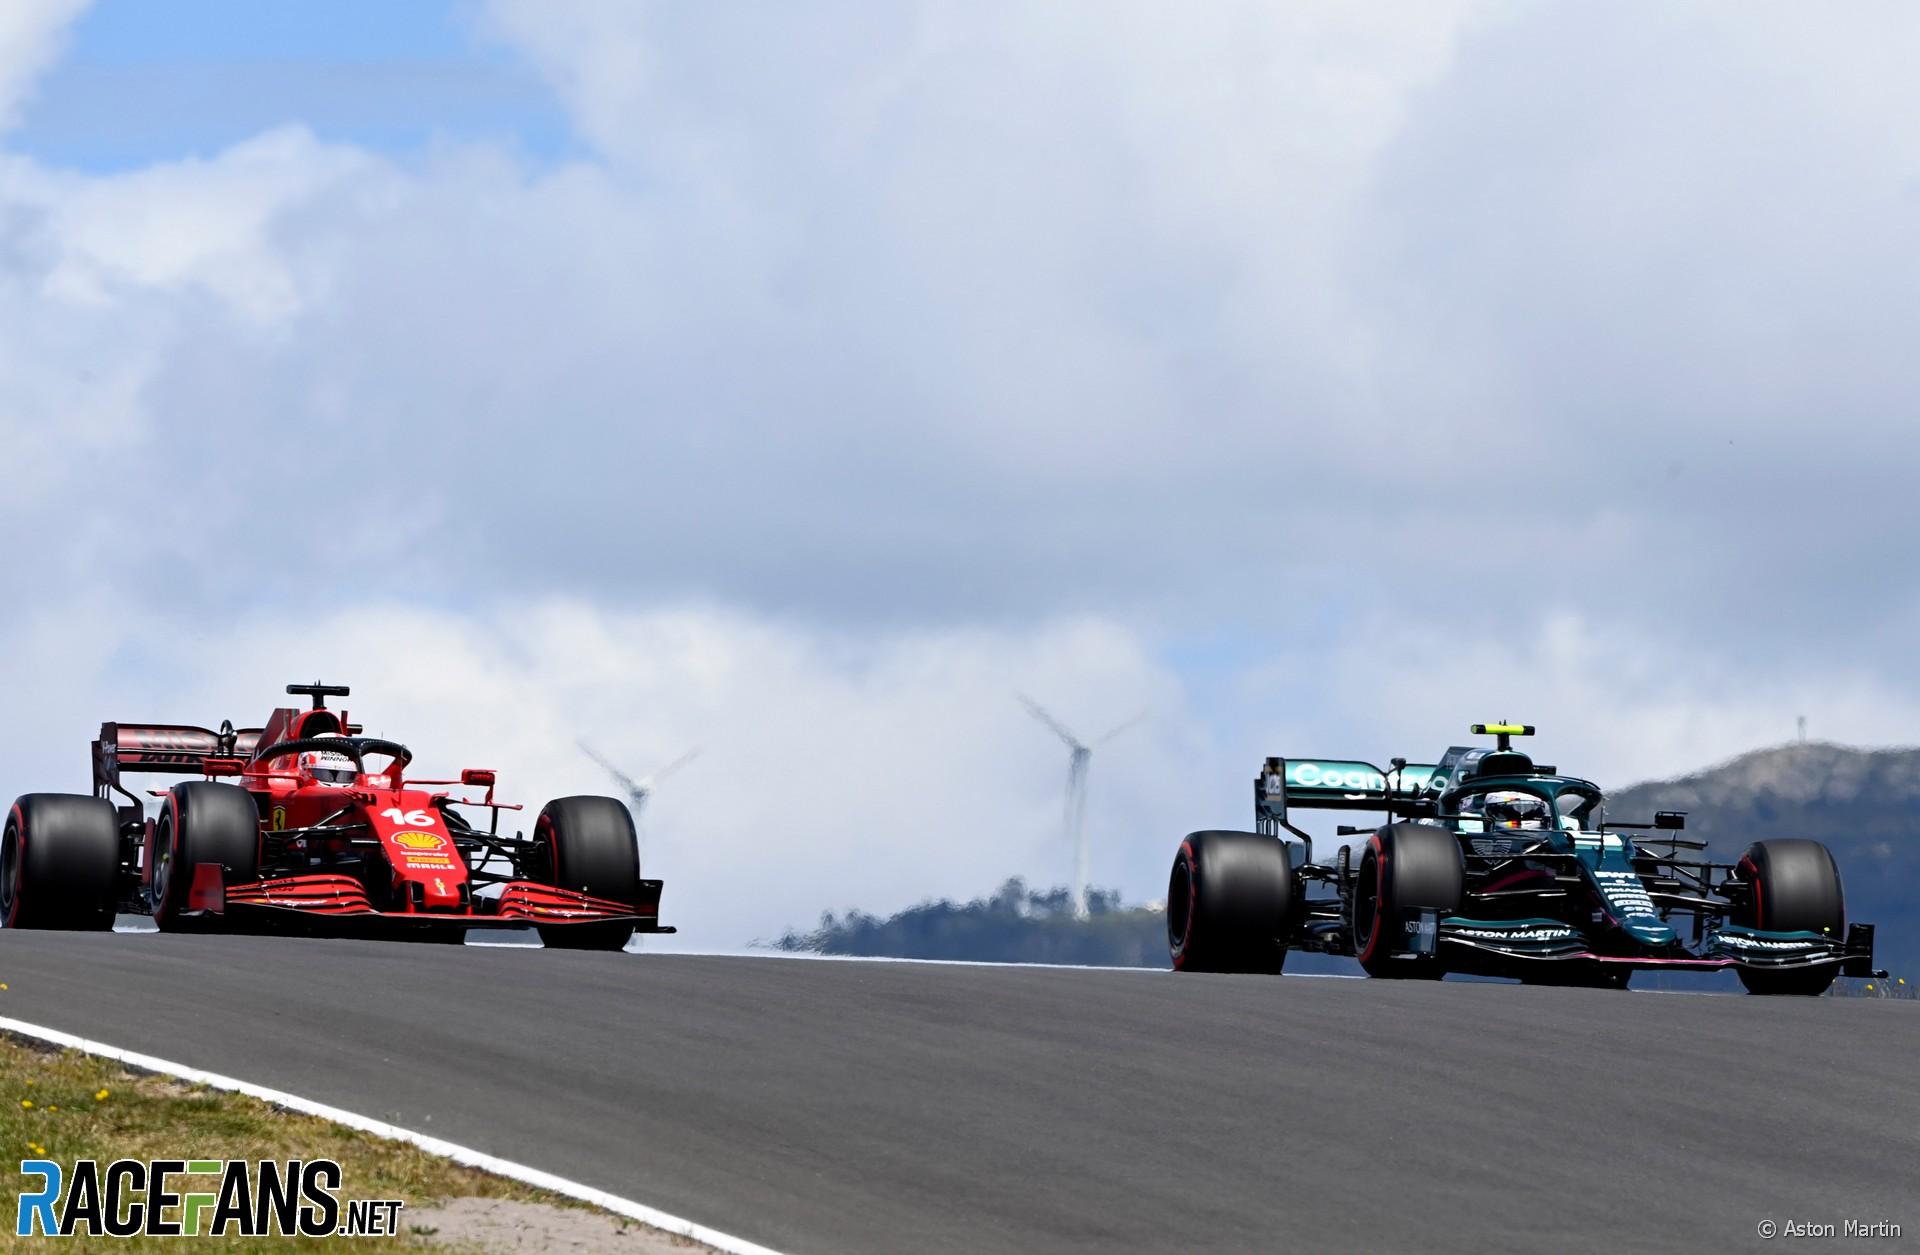 Charles Leclerc, Sebastian Vettel, Autodromo do Algarve, 2021